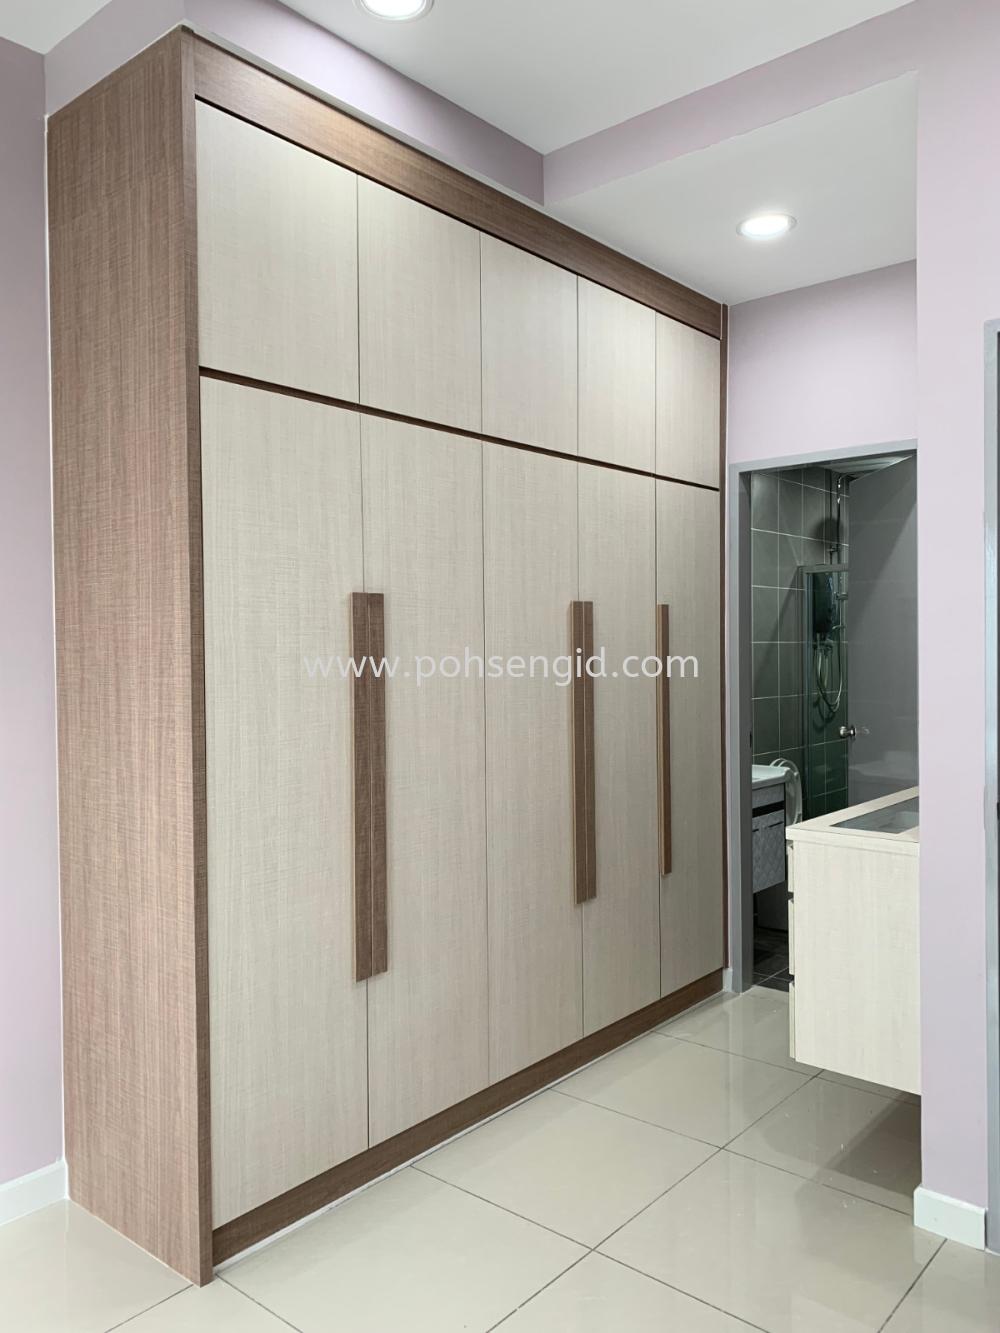 Bedroom Seremban, Senawang, Negeri Sembilan (NS), Malaysia. Renovation, Service, Interior Design, Supplier, Supply | Poh Seng Furniture & Interior Design